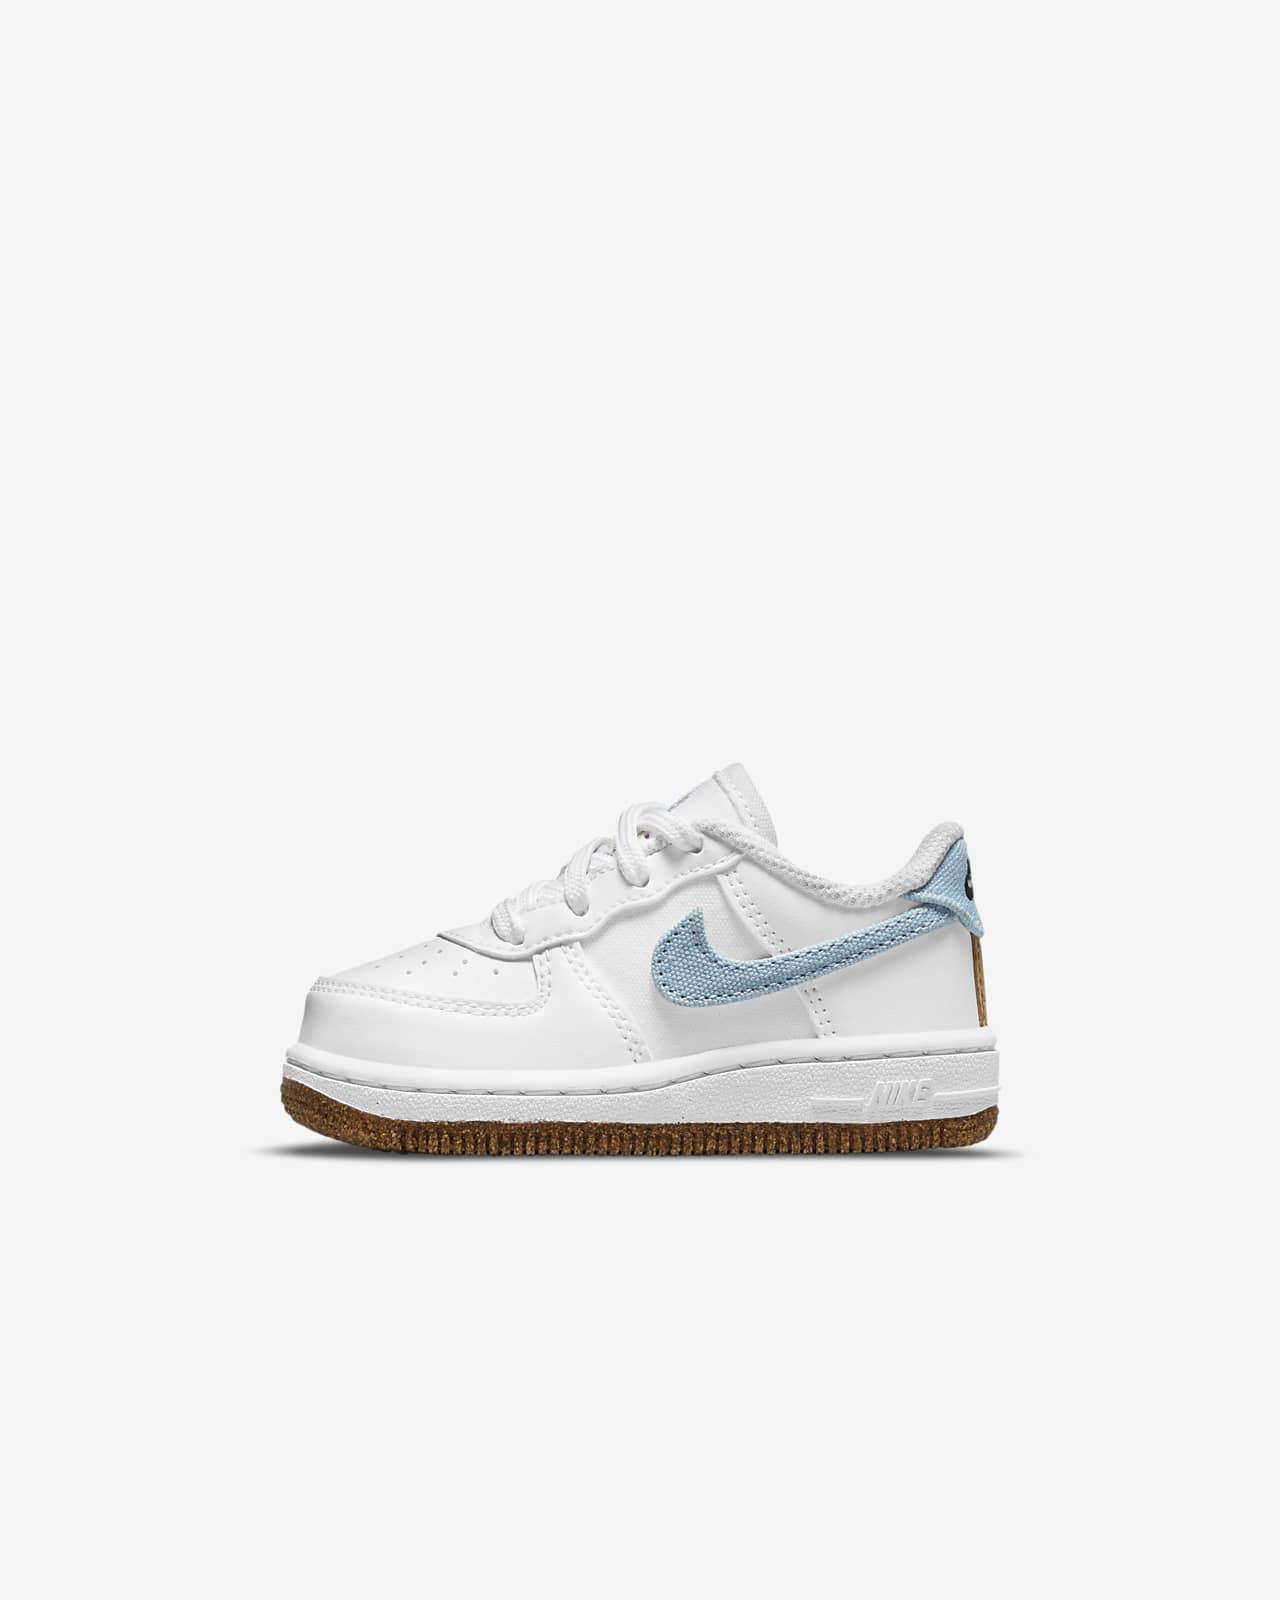 Nike Force 1 LV8 Baby & Toddler Shoe